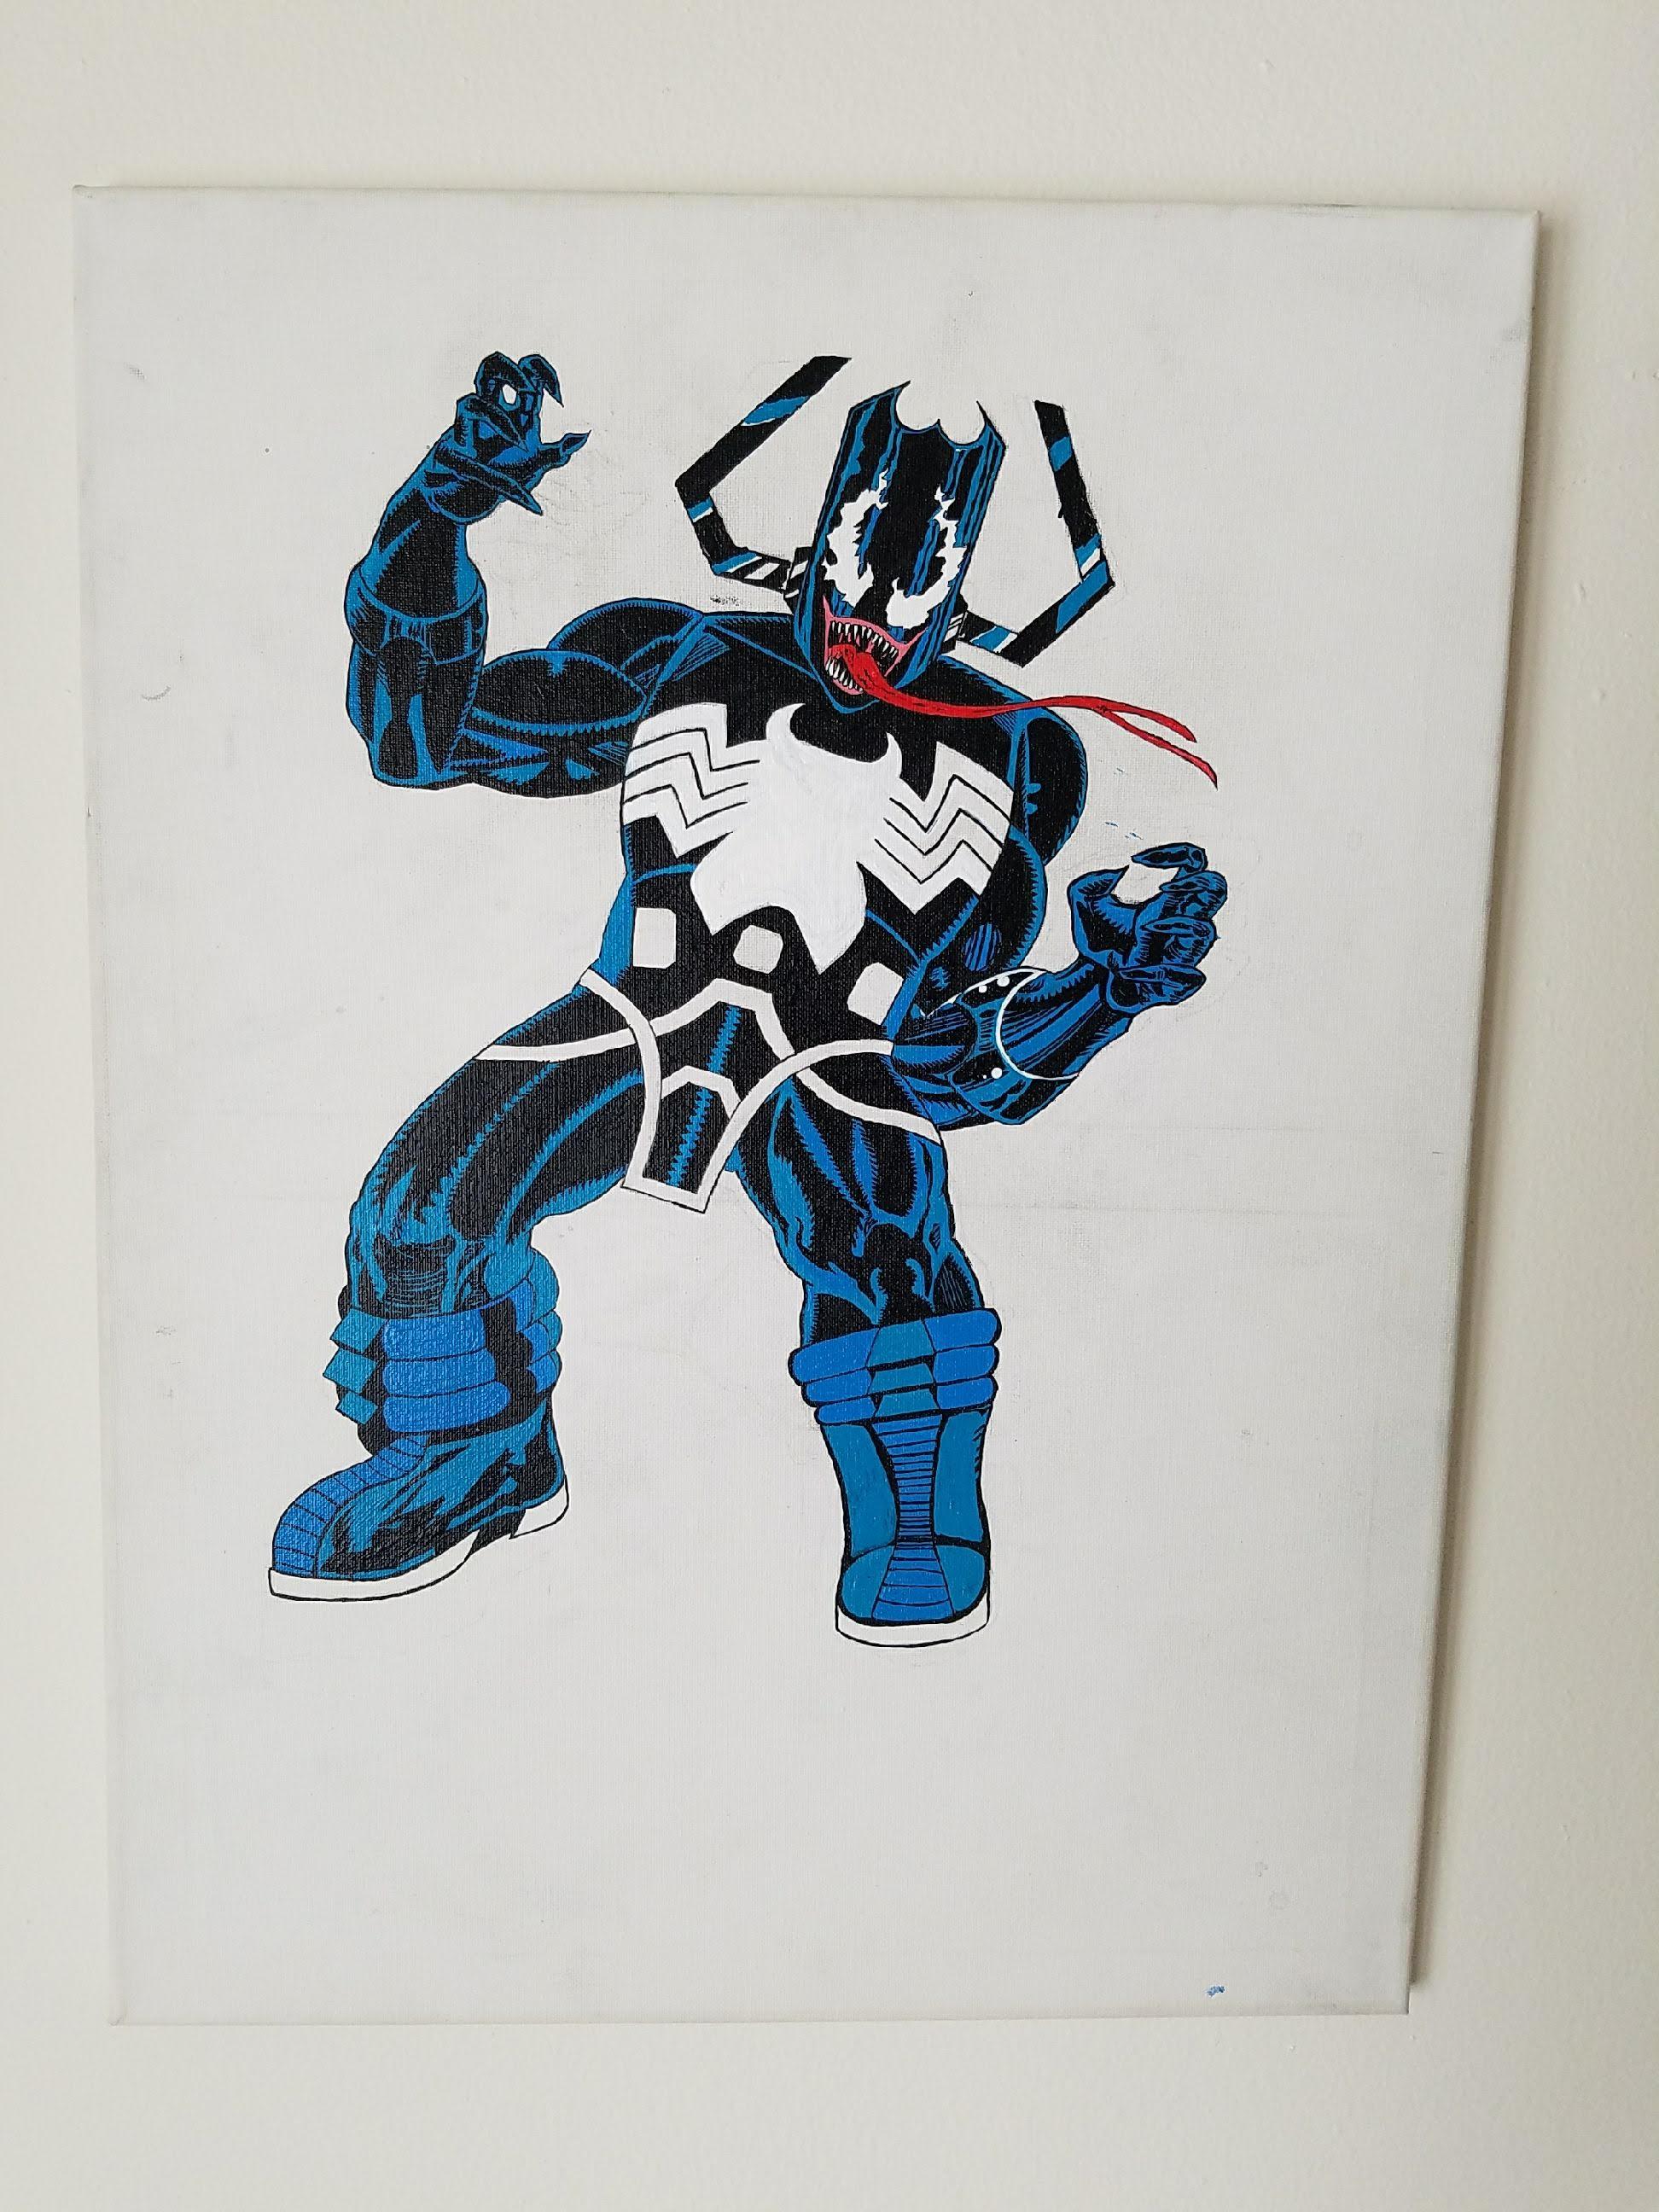 Venom vision